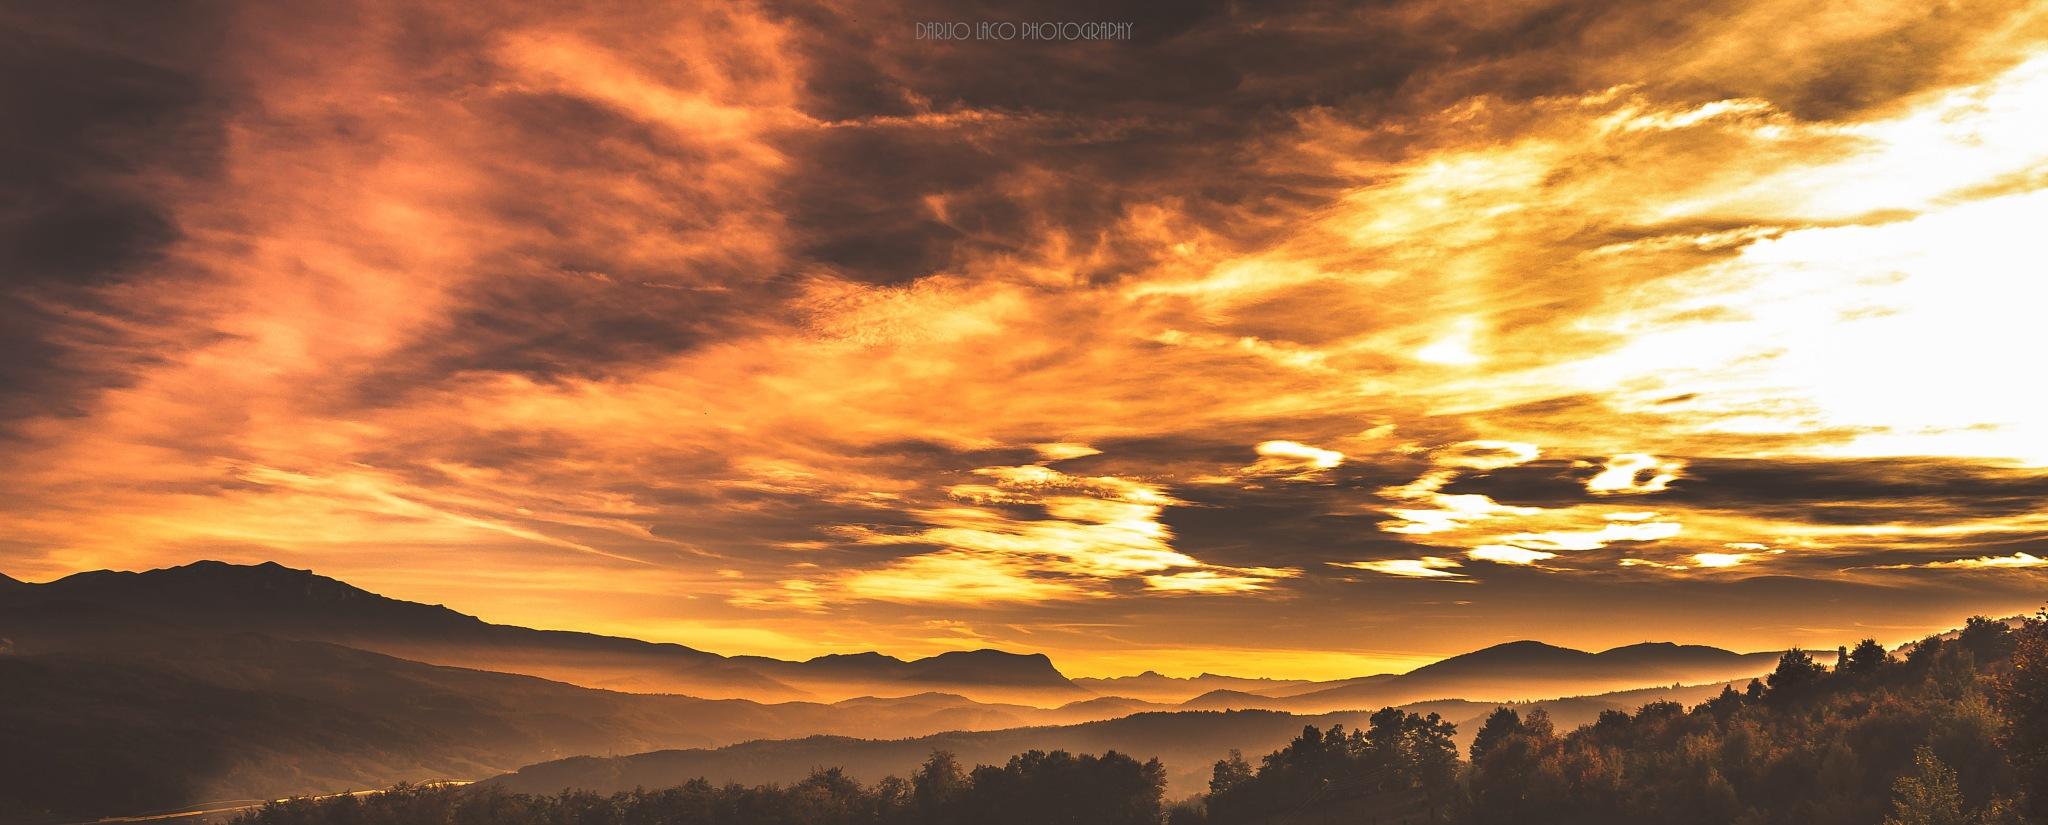 Autumnal Landscape by Darijo Laco